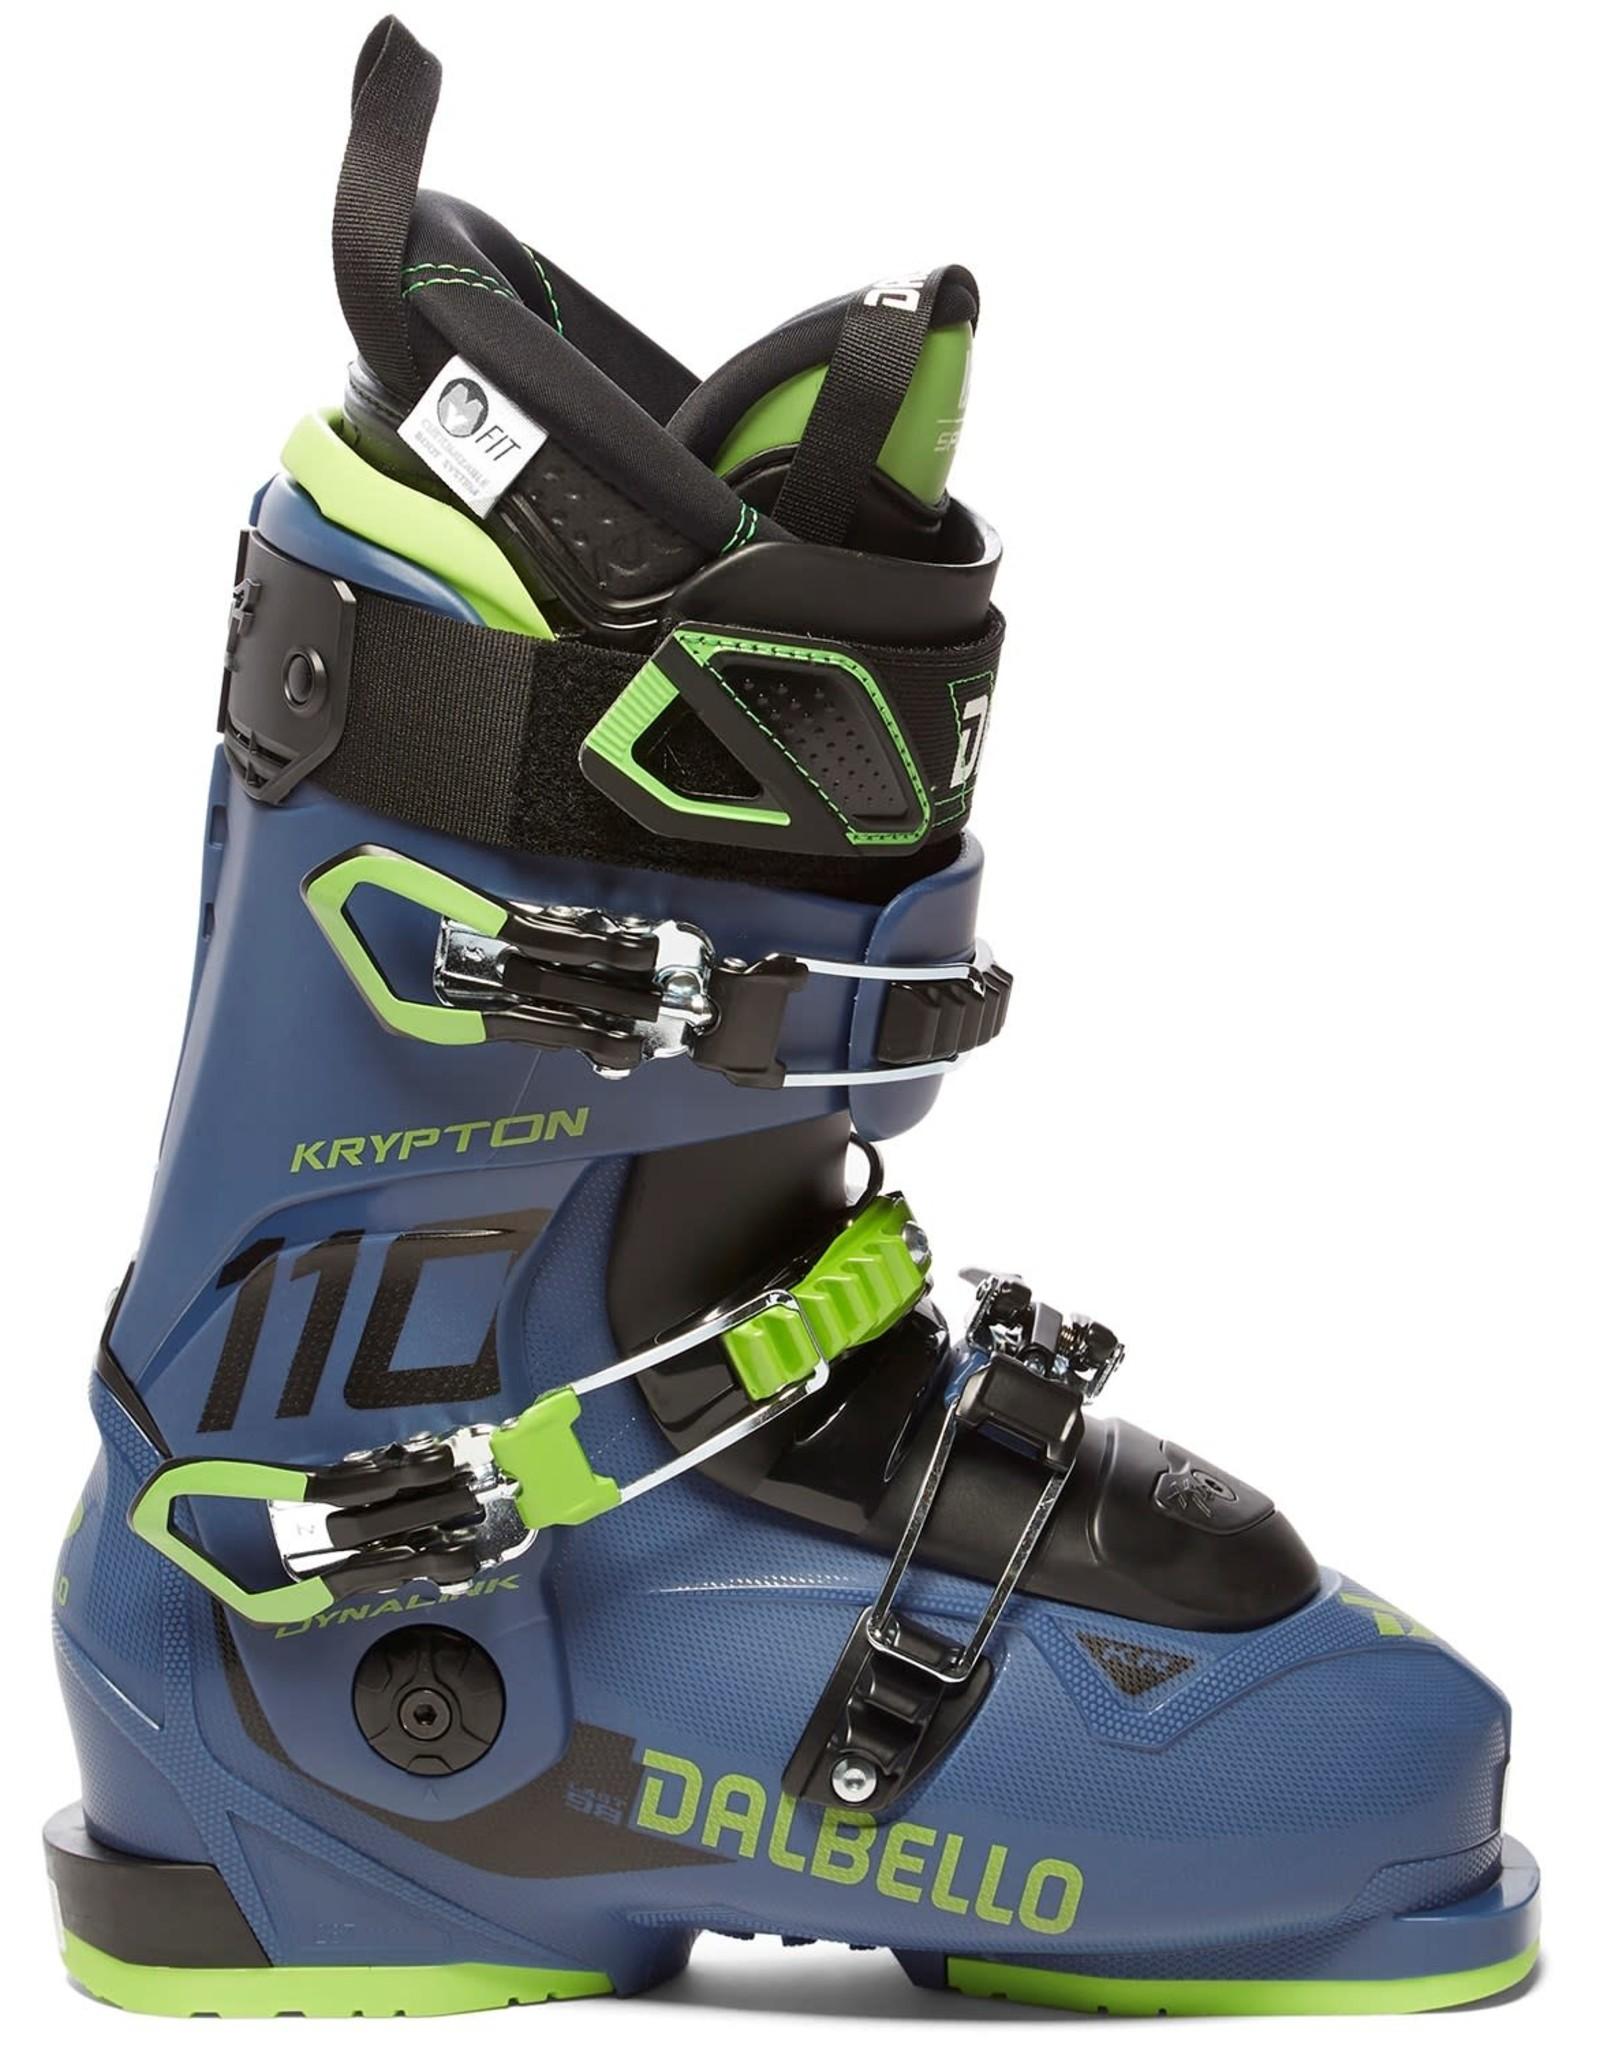 DALBELLO DALBELLO Ski Boots KRYPTON 110 (18/19)